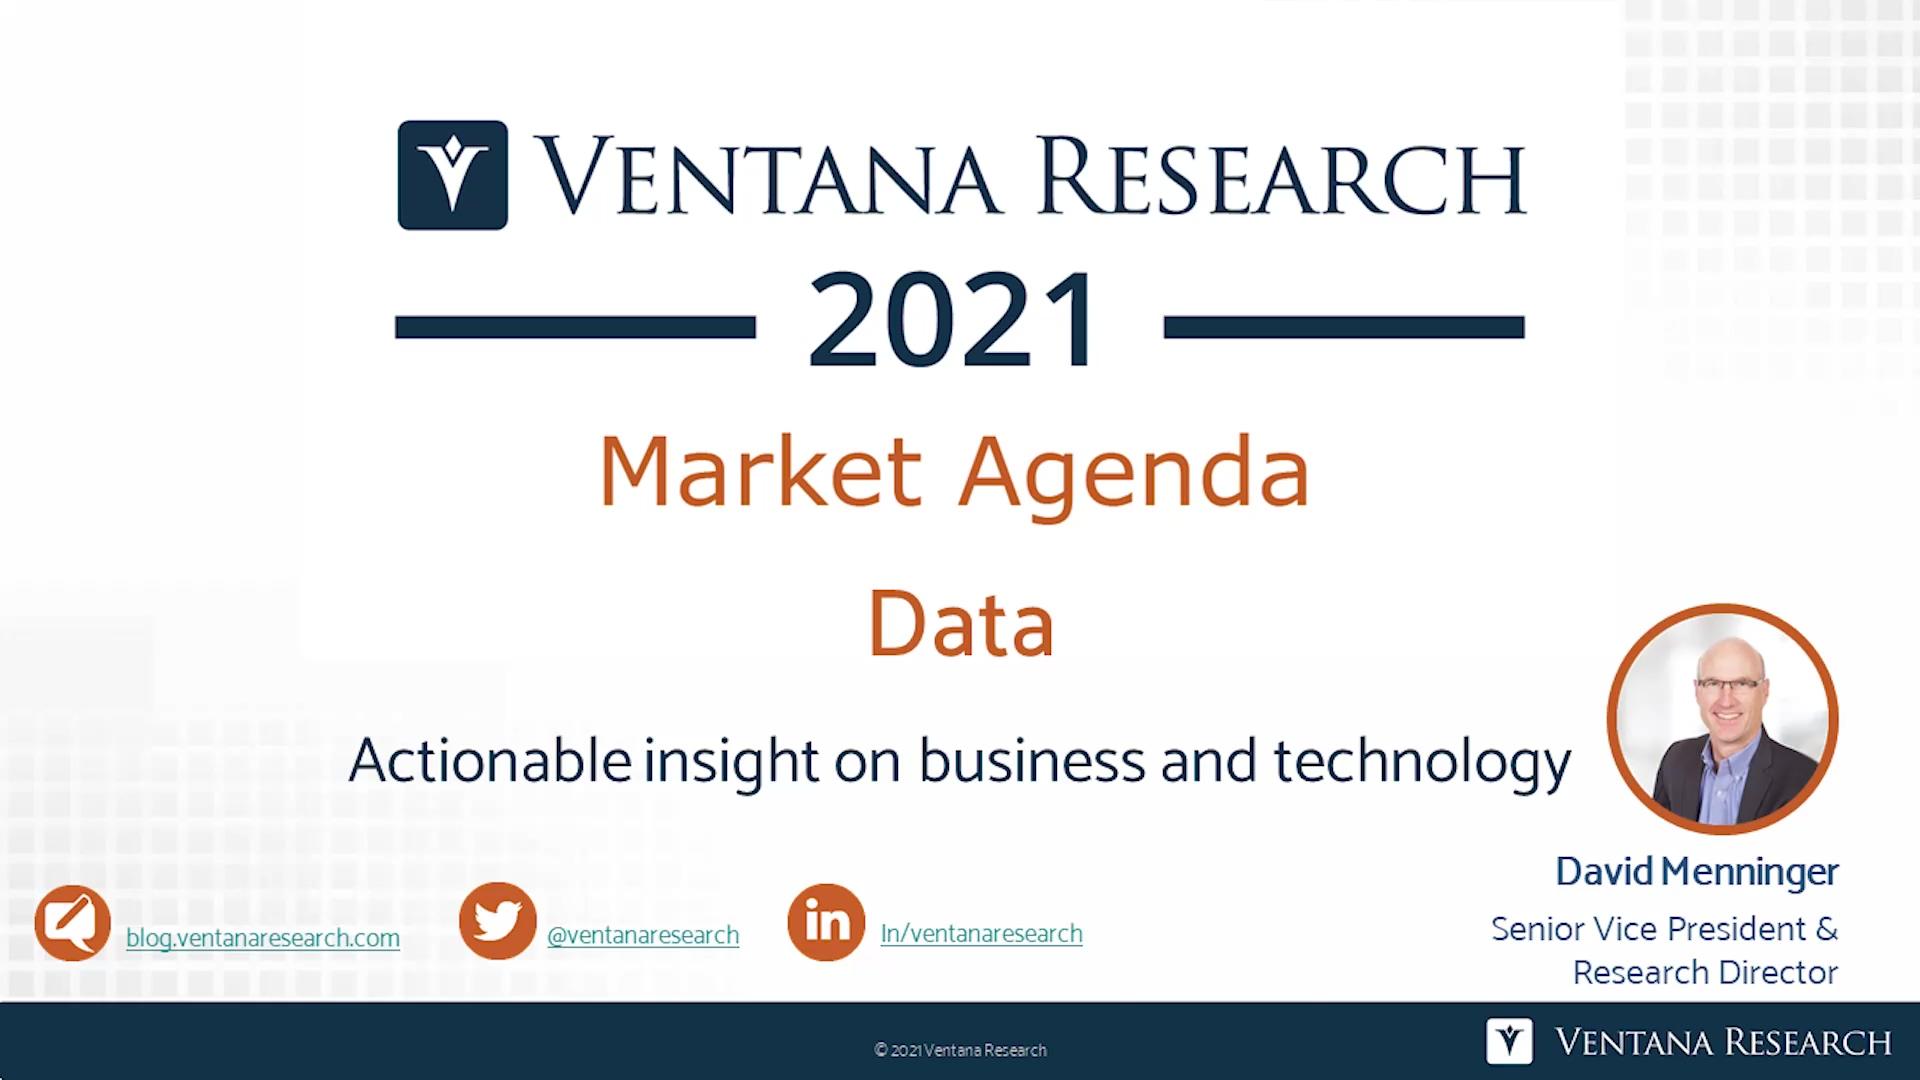 Ventana Research 2021 Market Agenda for Data